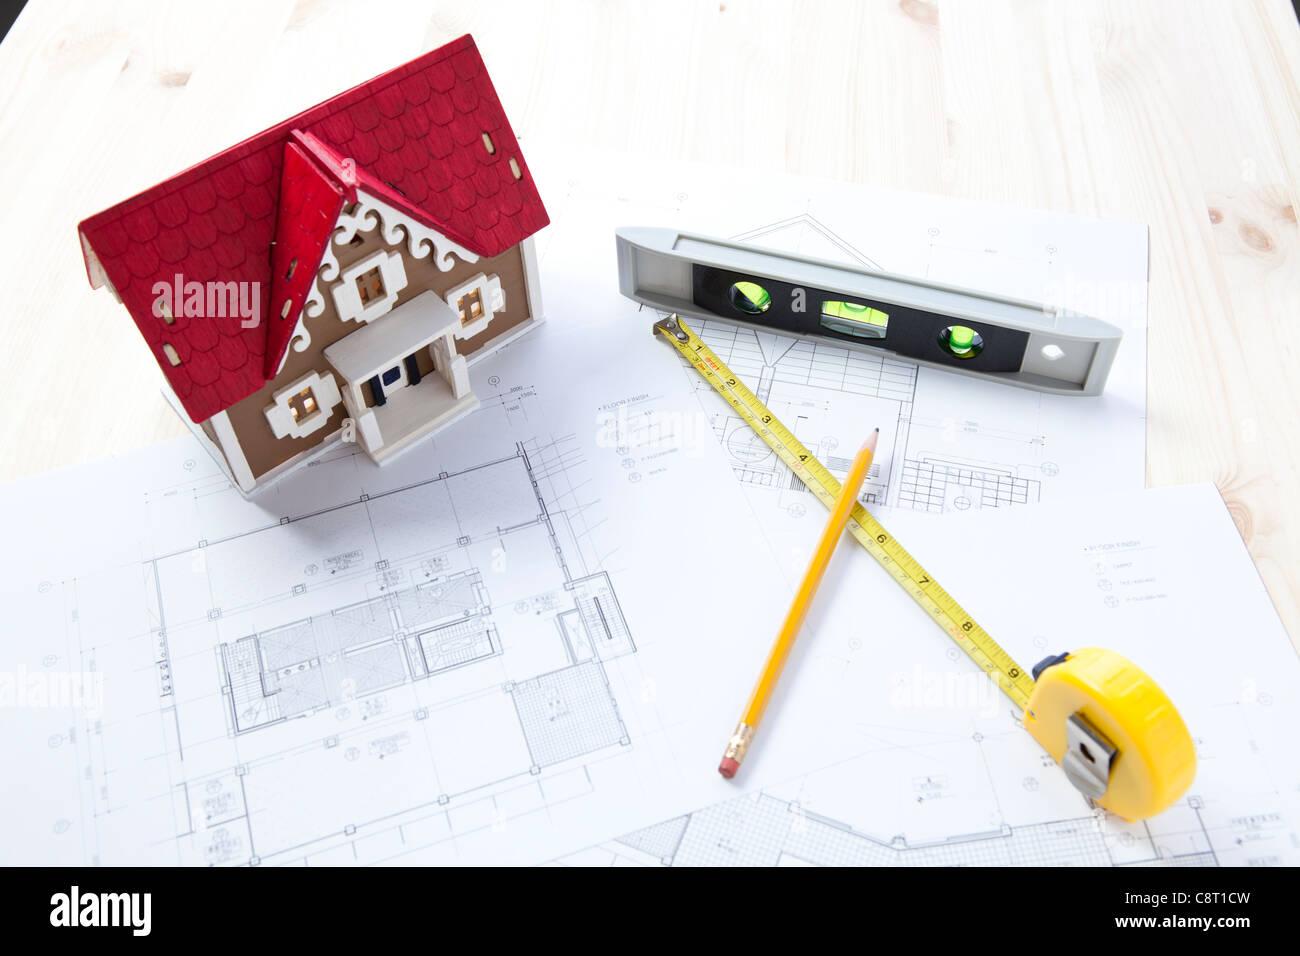 Model home diagram stock photos model home diagram stock images house diagram paper and house model stock image ccuart Gallery